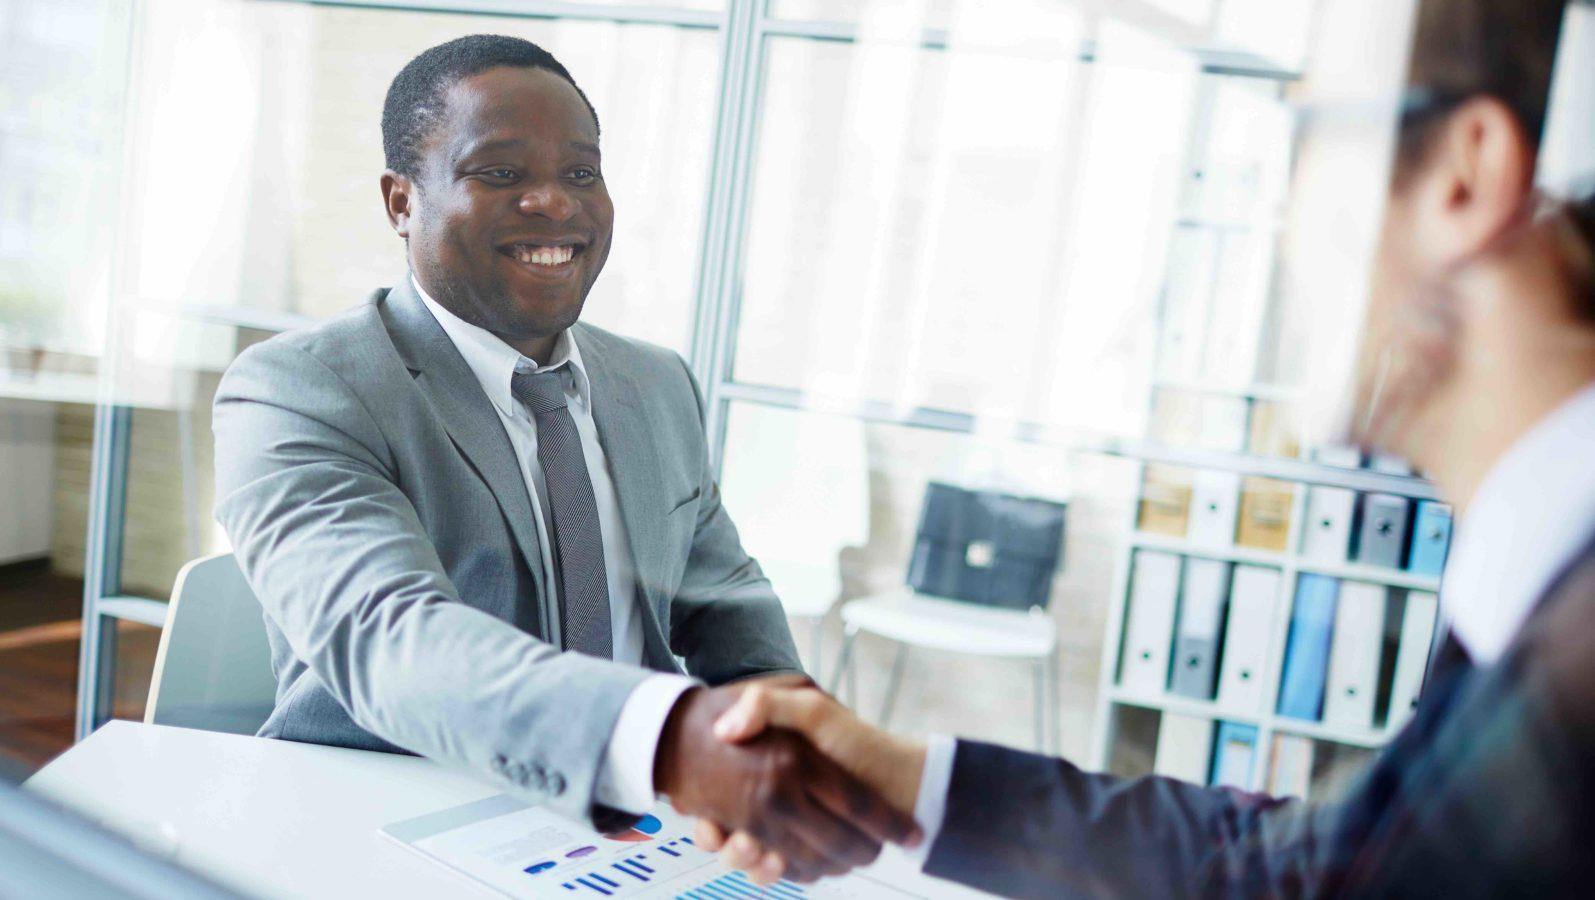 job interview, shaking hands at desk